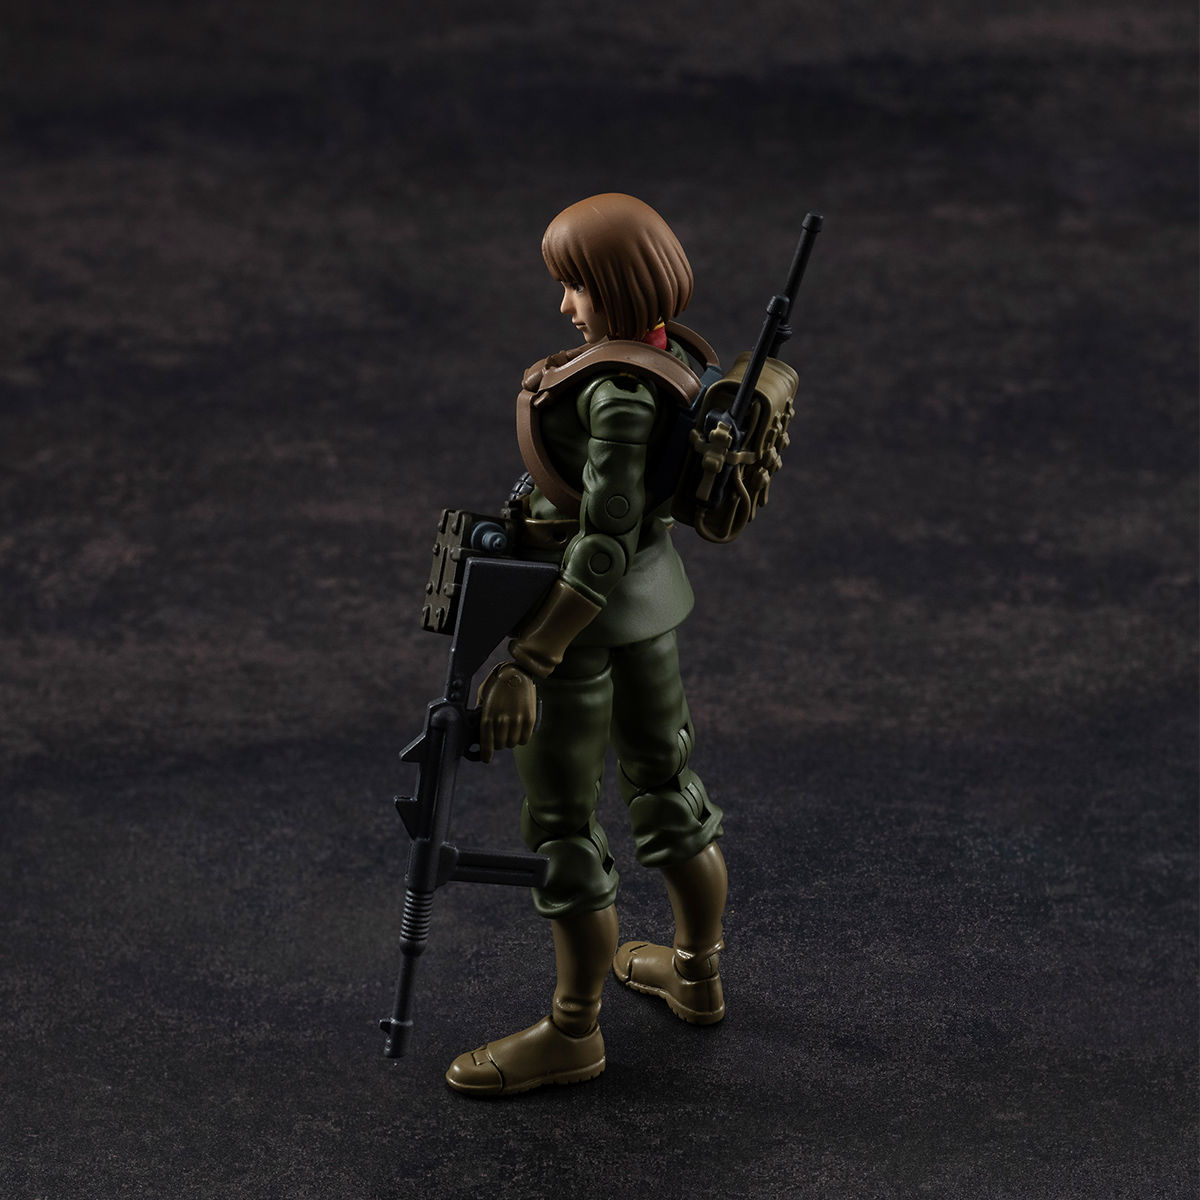 G.M.G. ガンダムミリタリージェネレーション『ジオン公国軍一般兵士01』1/18 可動フィギュア-018